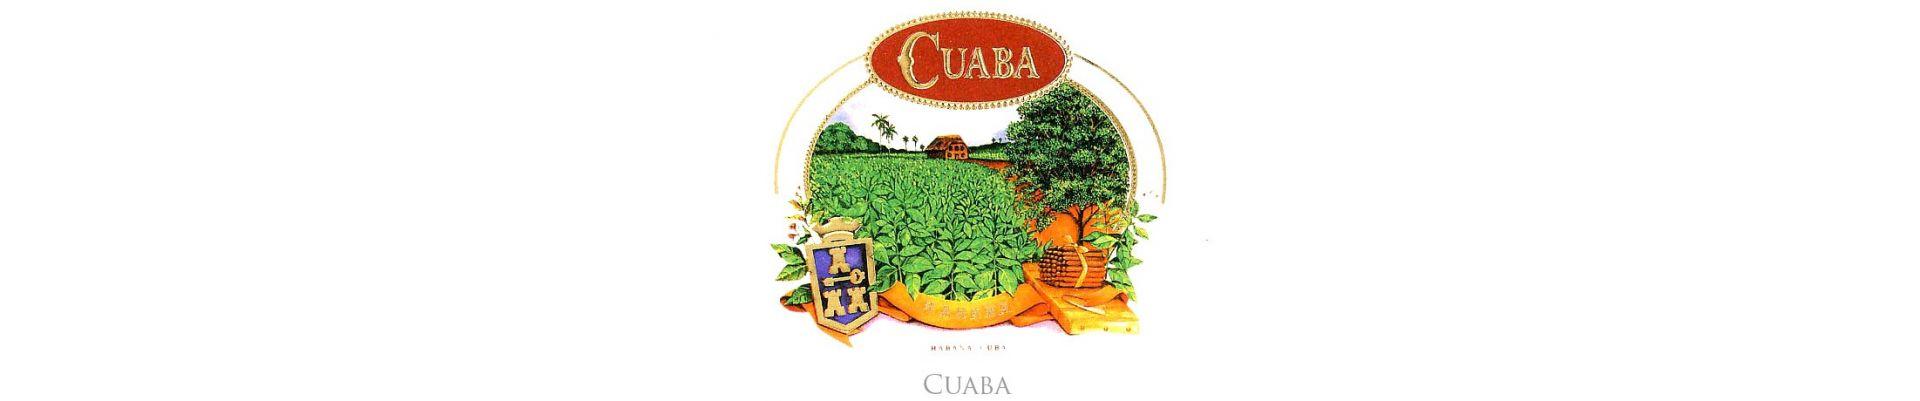 Trabucuri Cuaba trabucuri cubaneze Cuaba trabuc cubanez.Magazin trabuc